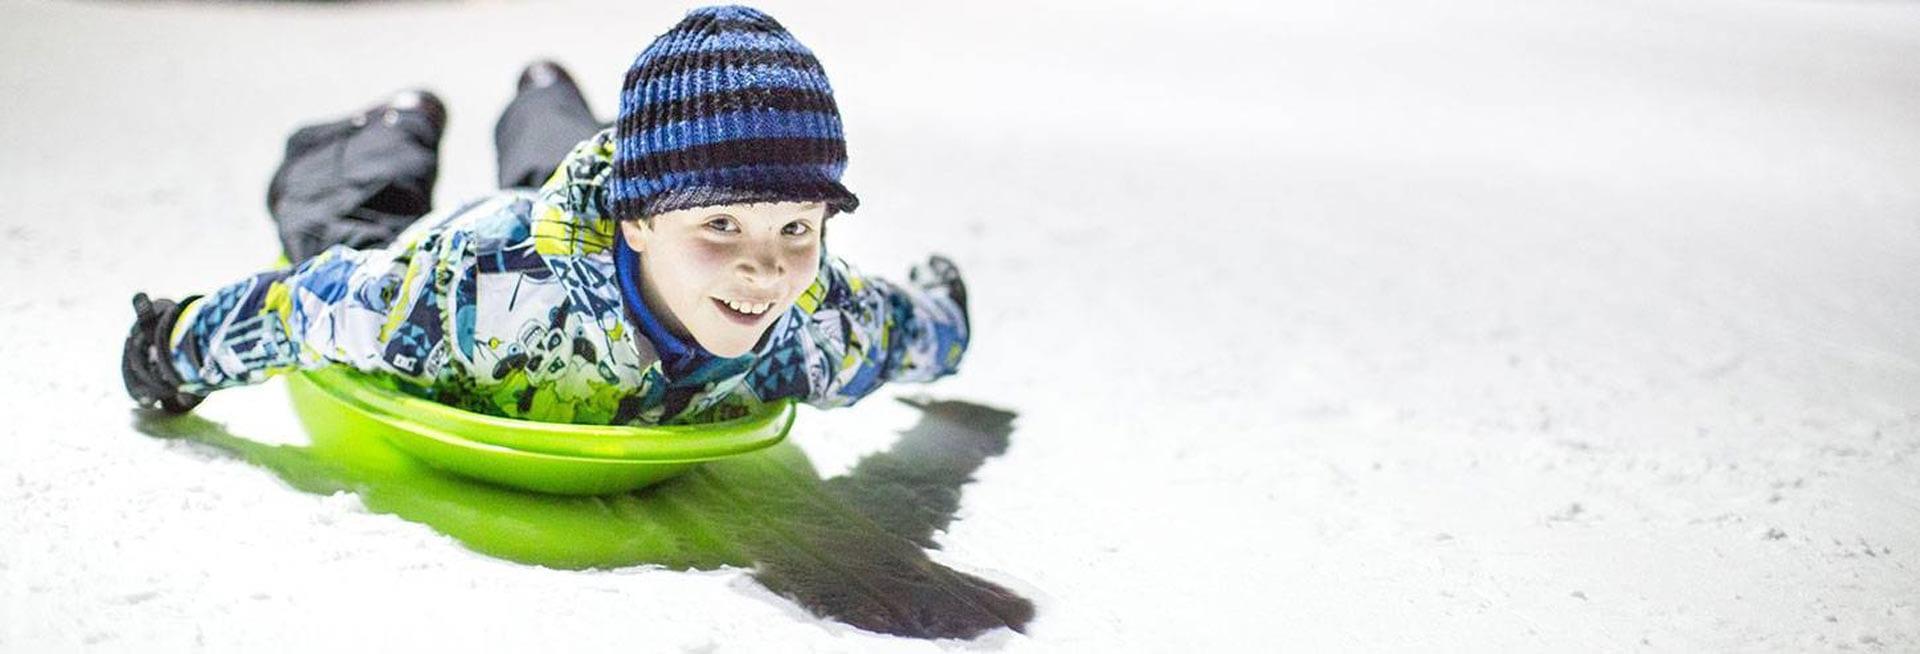 Boy sledding face first.